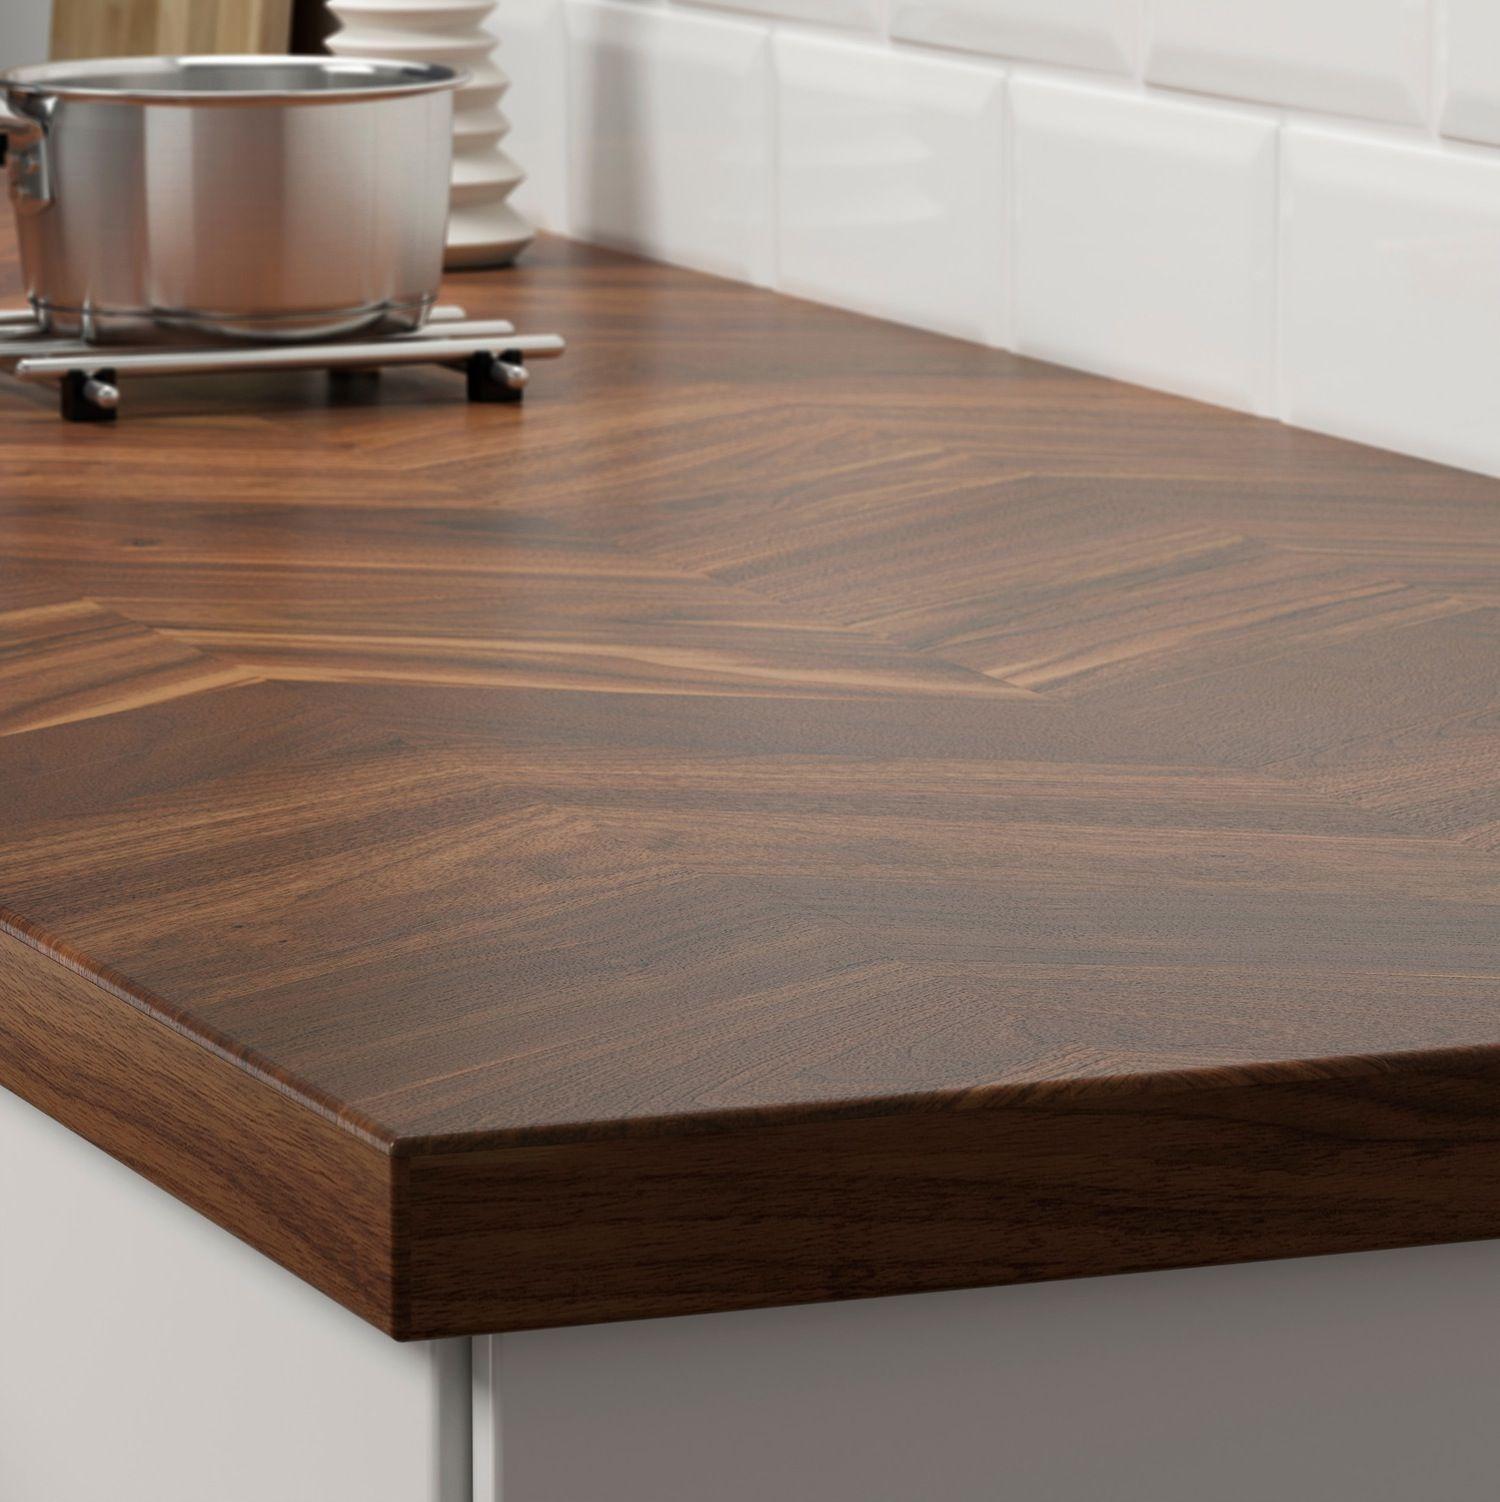 Ikea Kitchen Countertop: Countertop, Herringbone Pattern And Ikea Hack